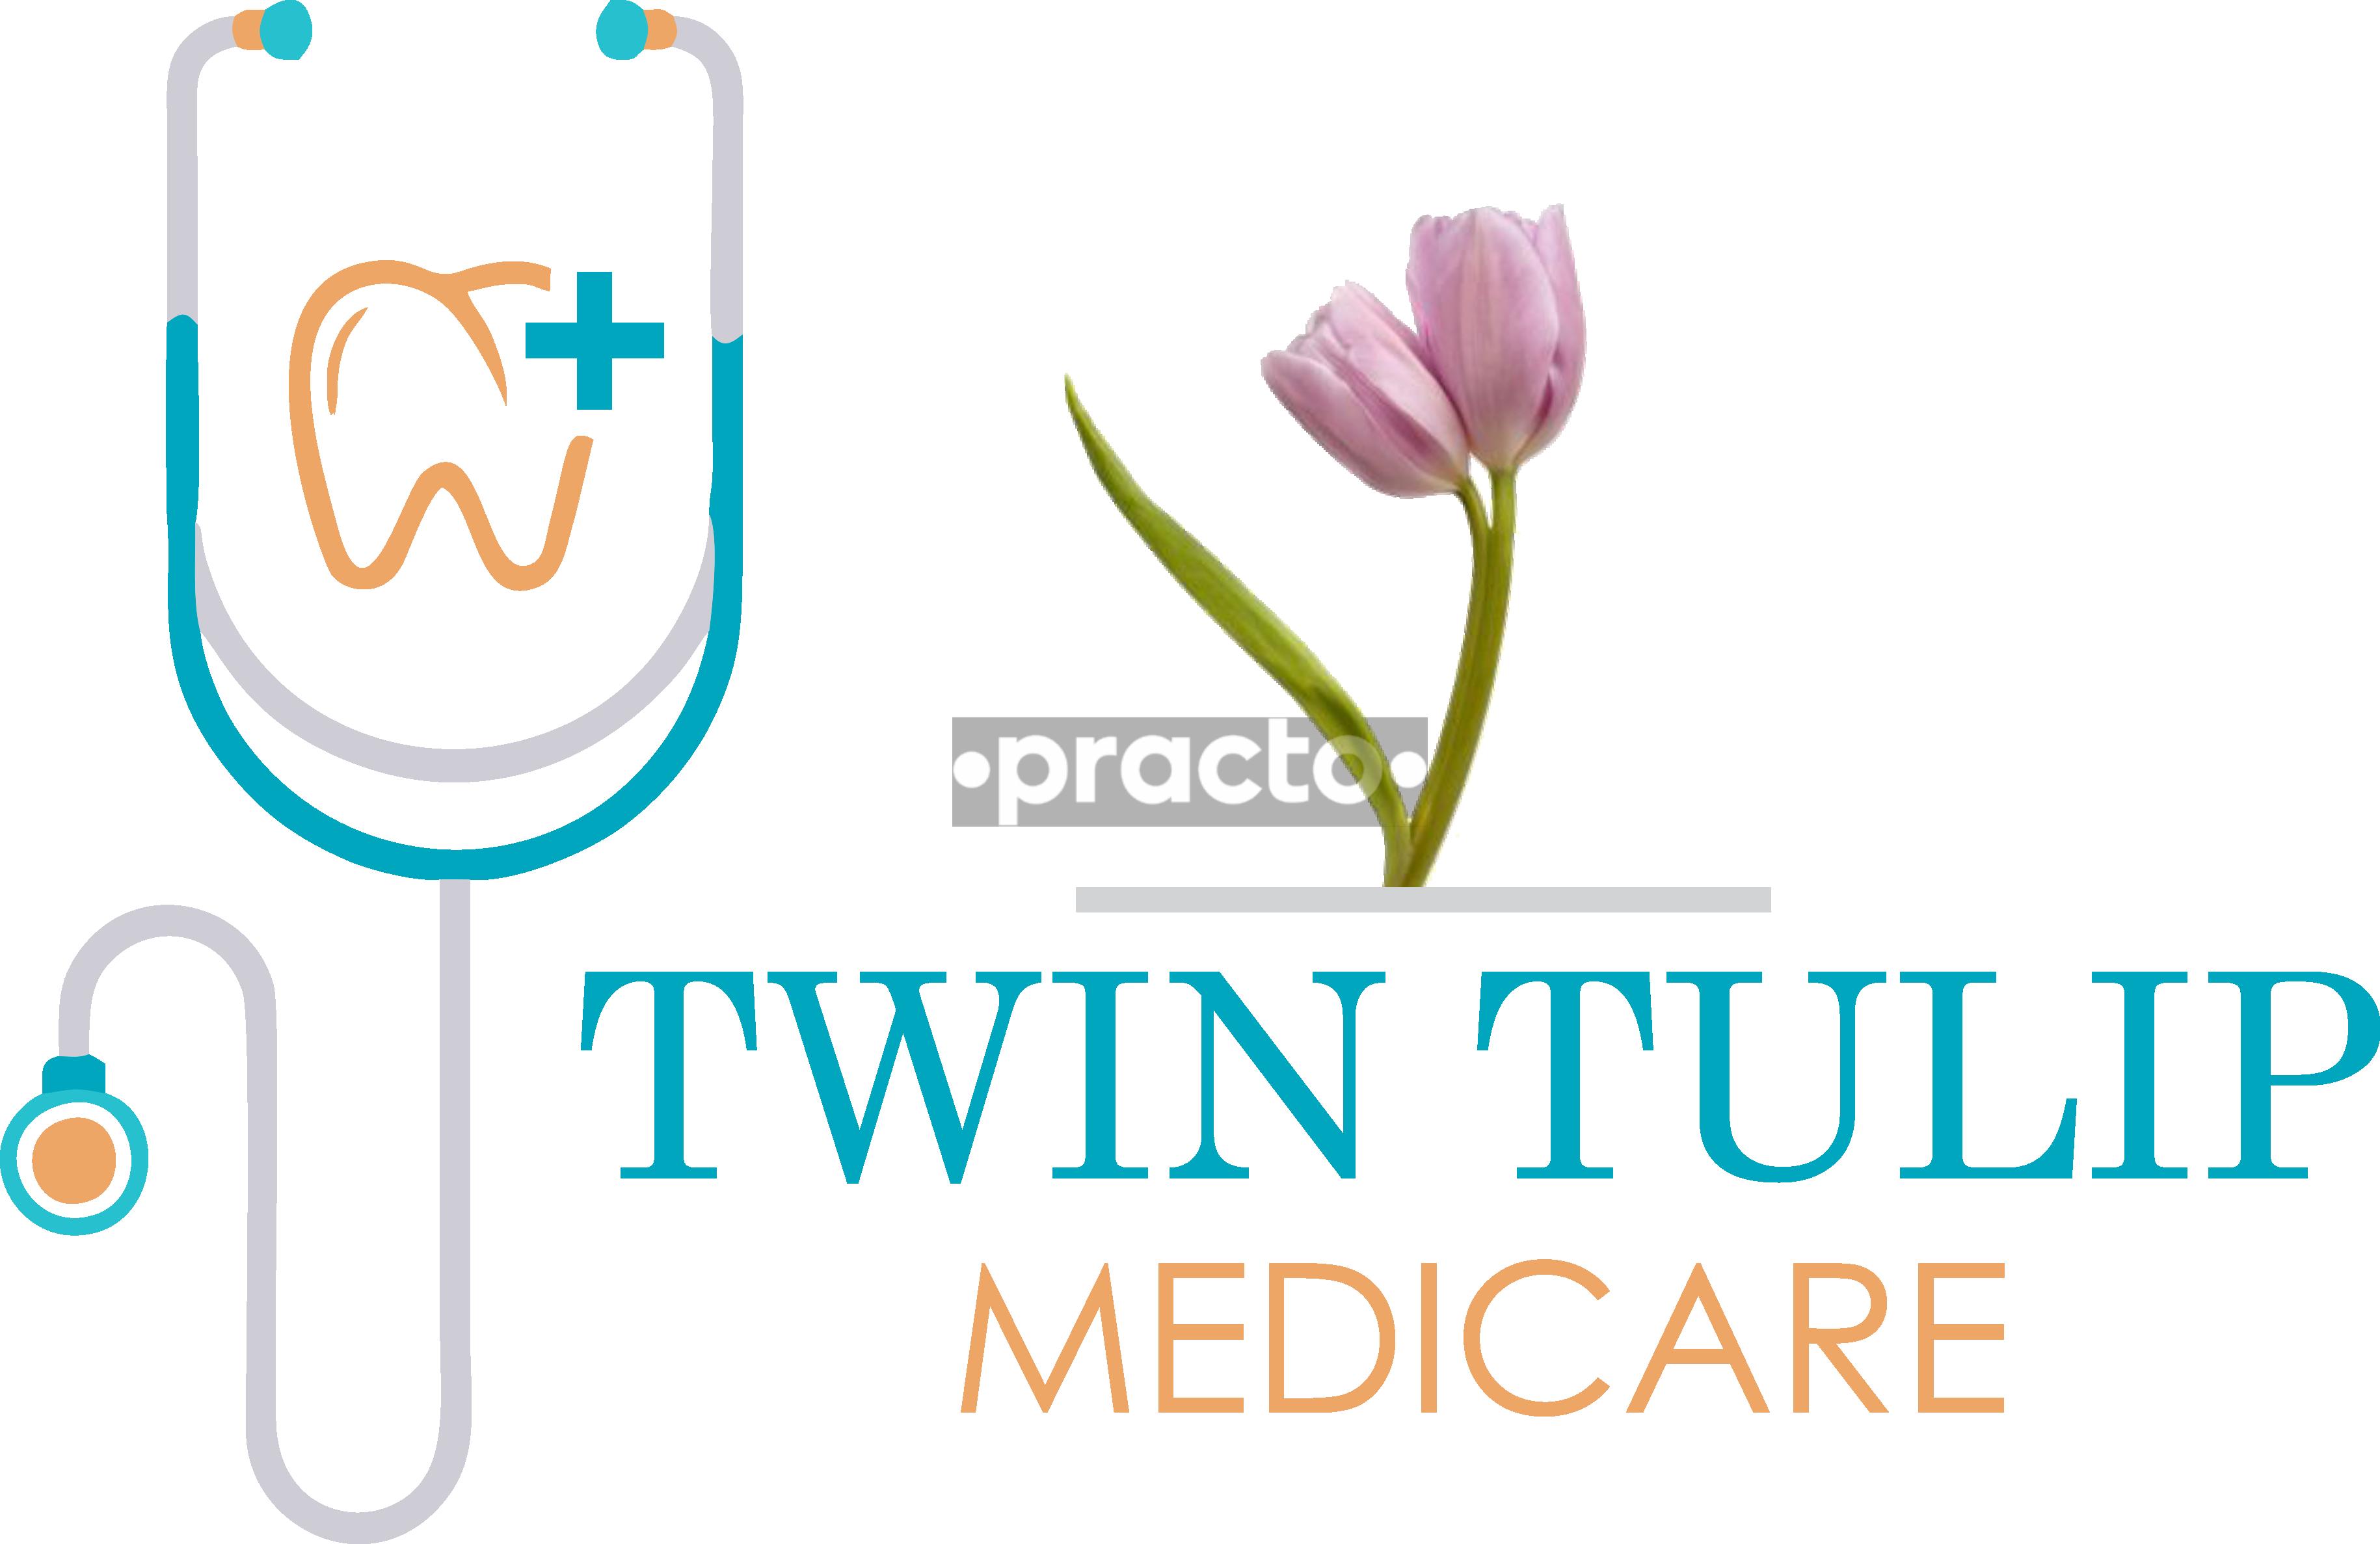 Twin Tulip Medicare